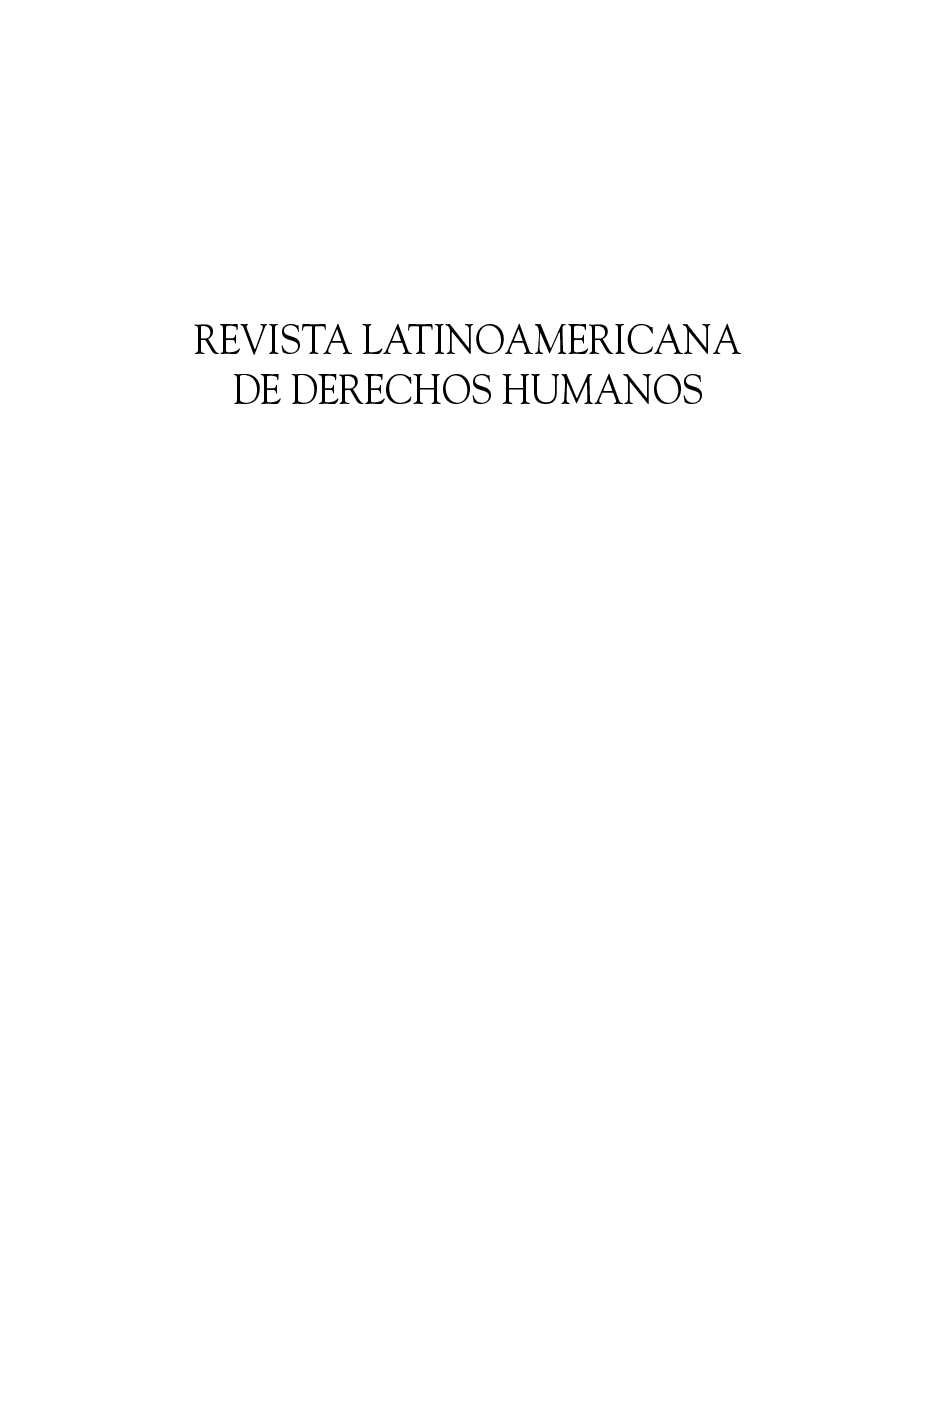 Calaméo - REVISTA LATINOAMERICANA DE DERECHOS HUMANOS 19